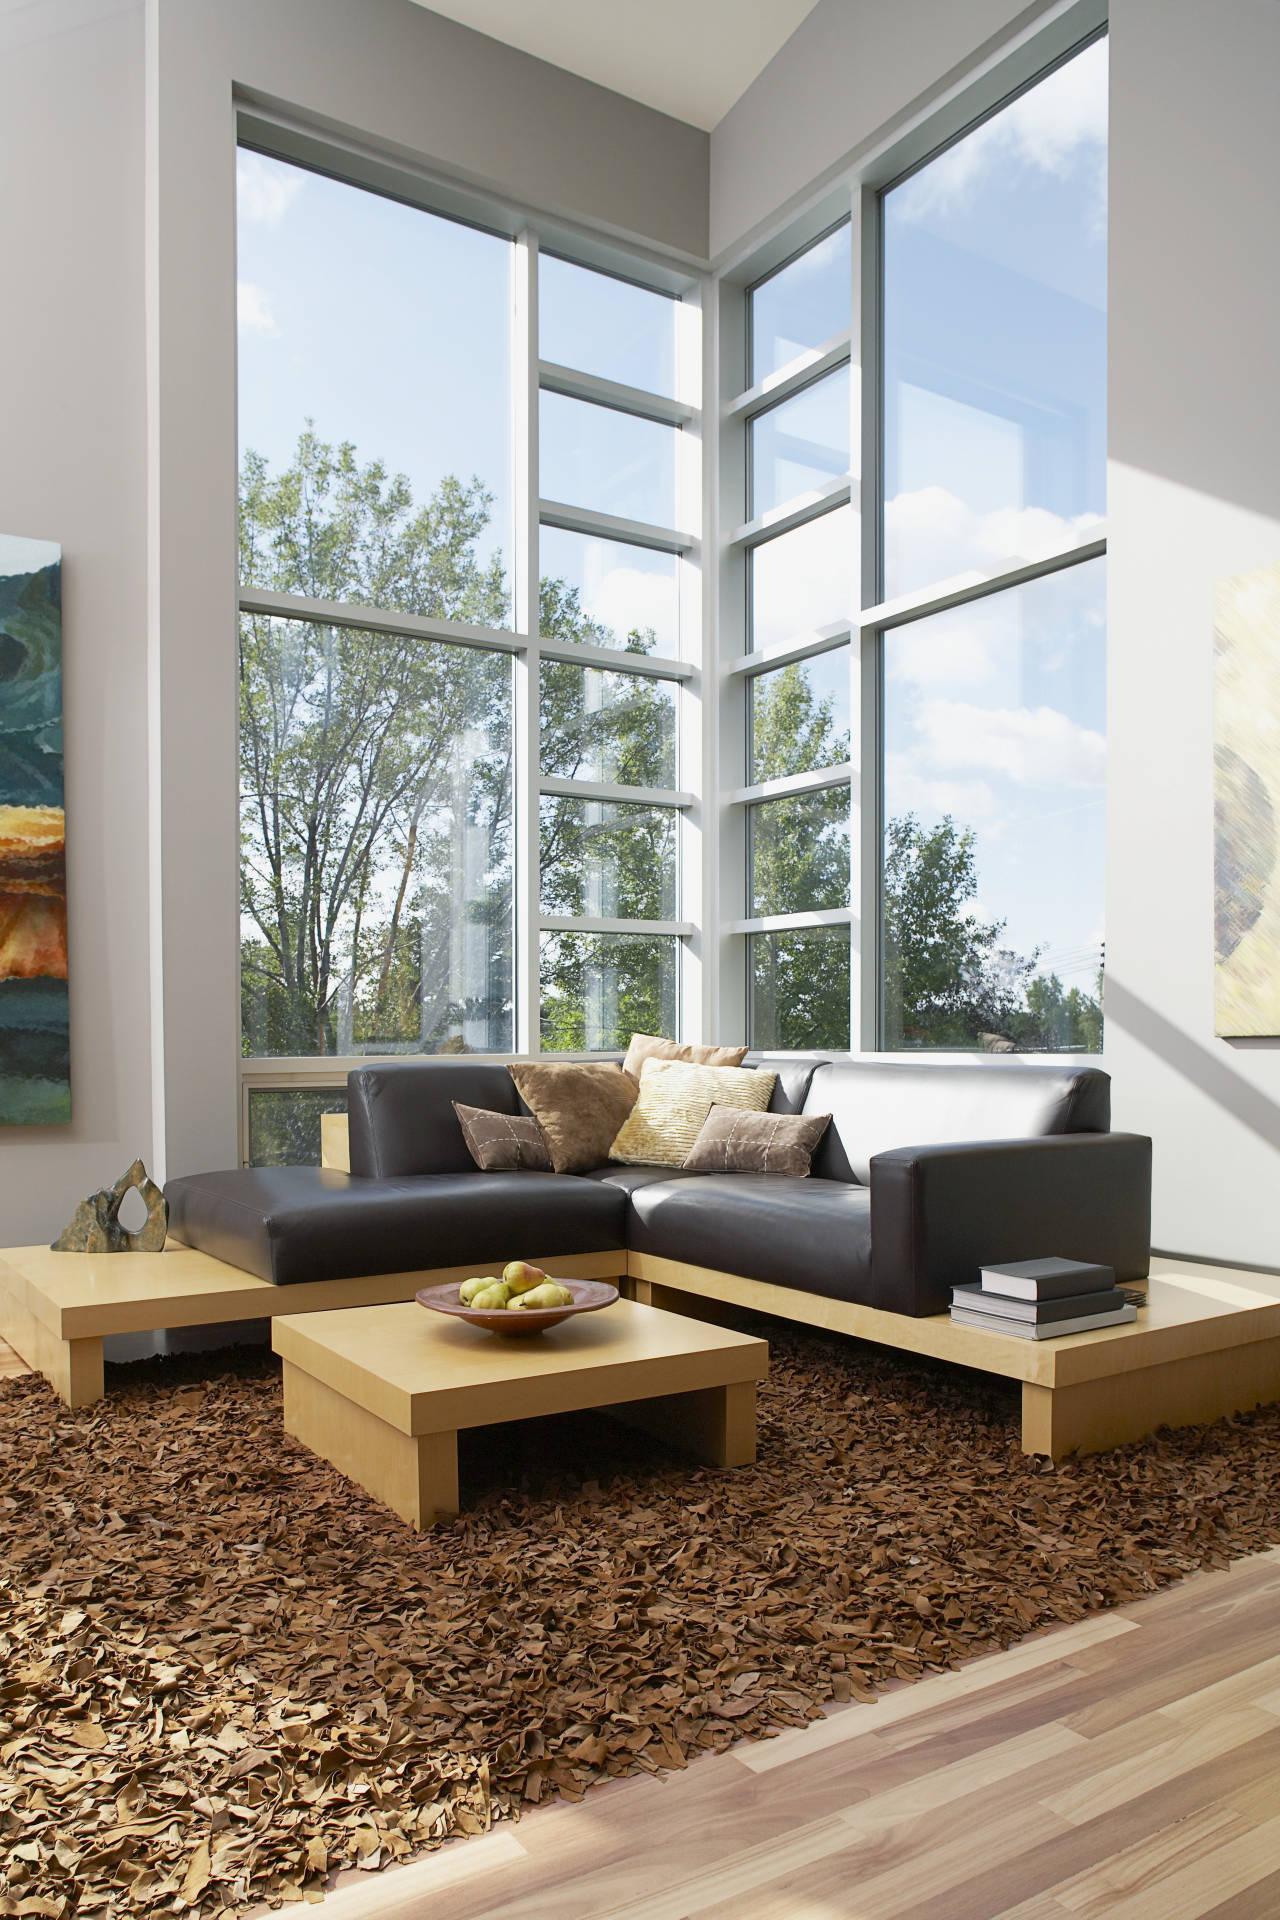 Películas para ventanas LLumar® de Eastman, Protección UV : Fotografía © Eastman Chemical Company México